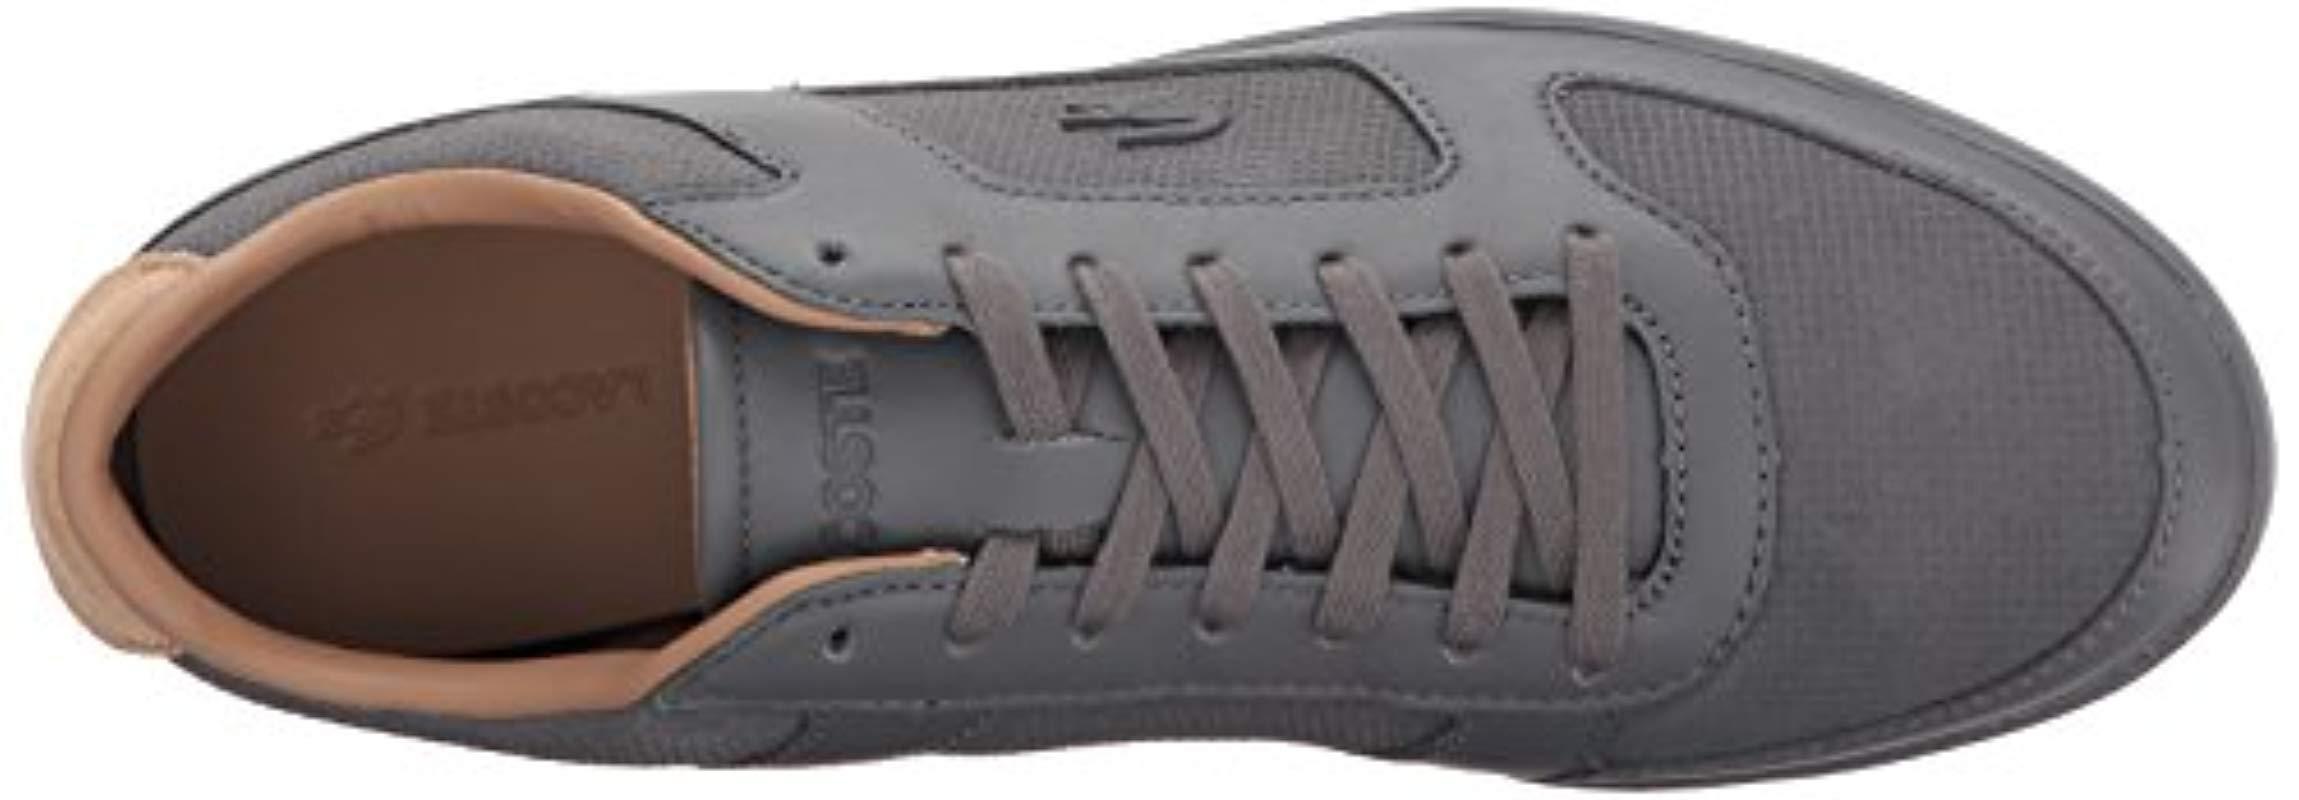 b5fb0deb17c3d4 Lacoste - Gray Court-minimal 317 1 Sneaker for Men - Lyst. View fullscreen